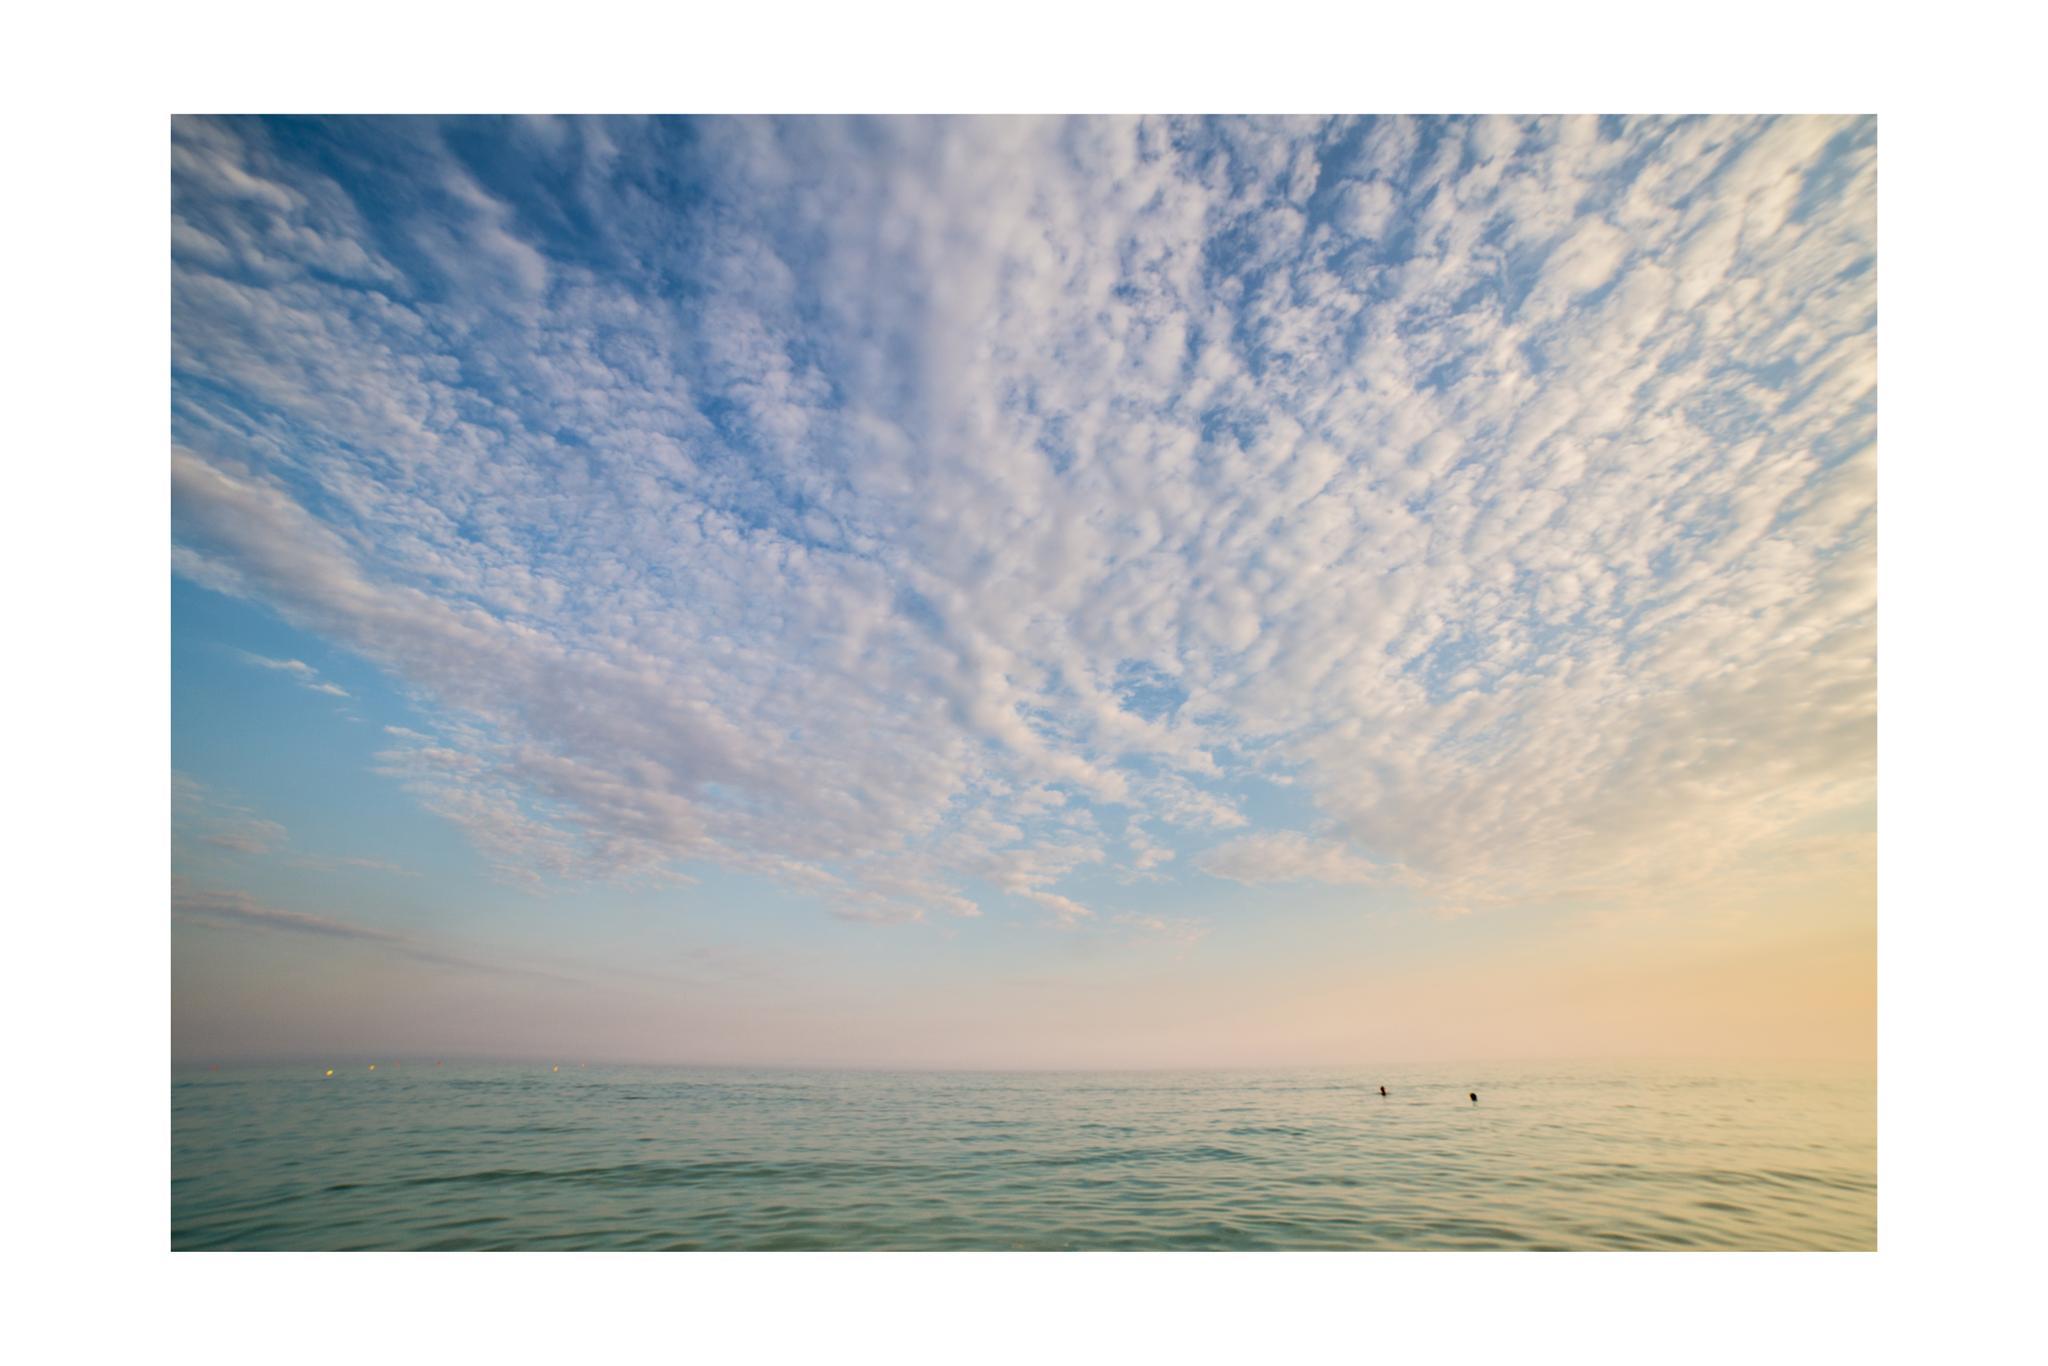 down by the sea by Fabio Sari